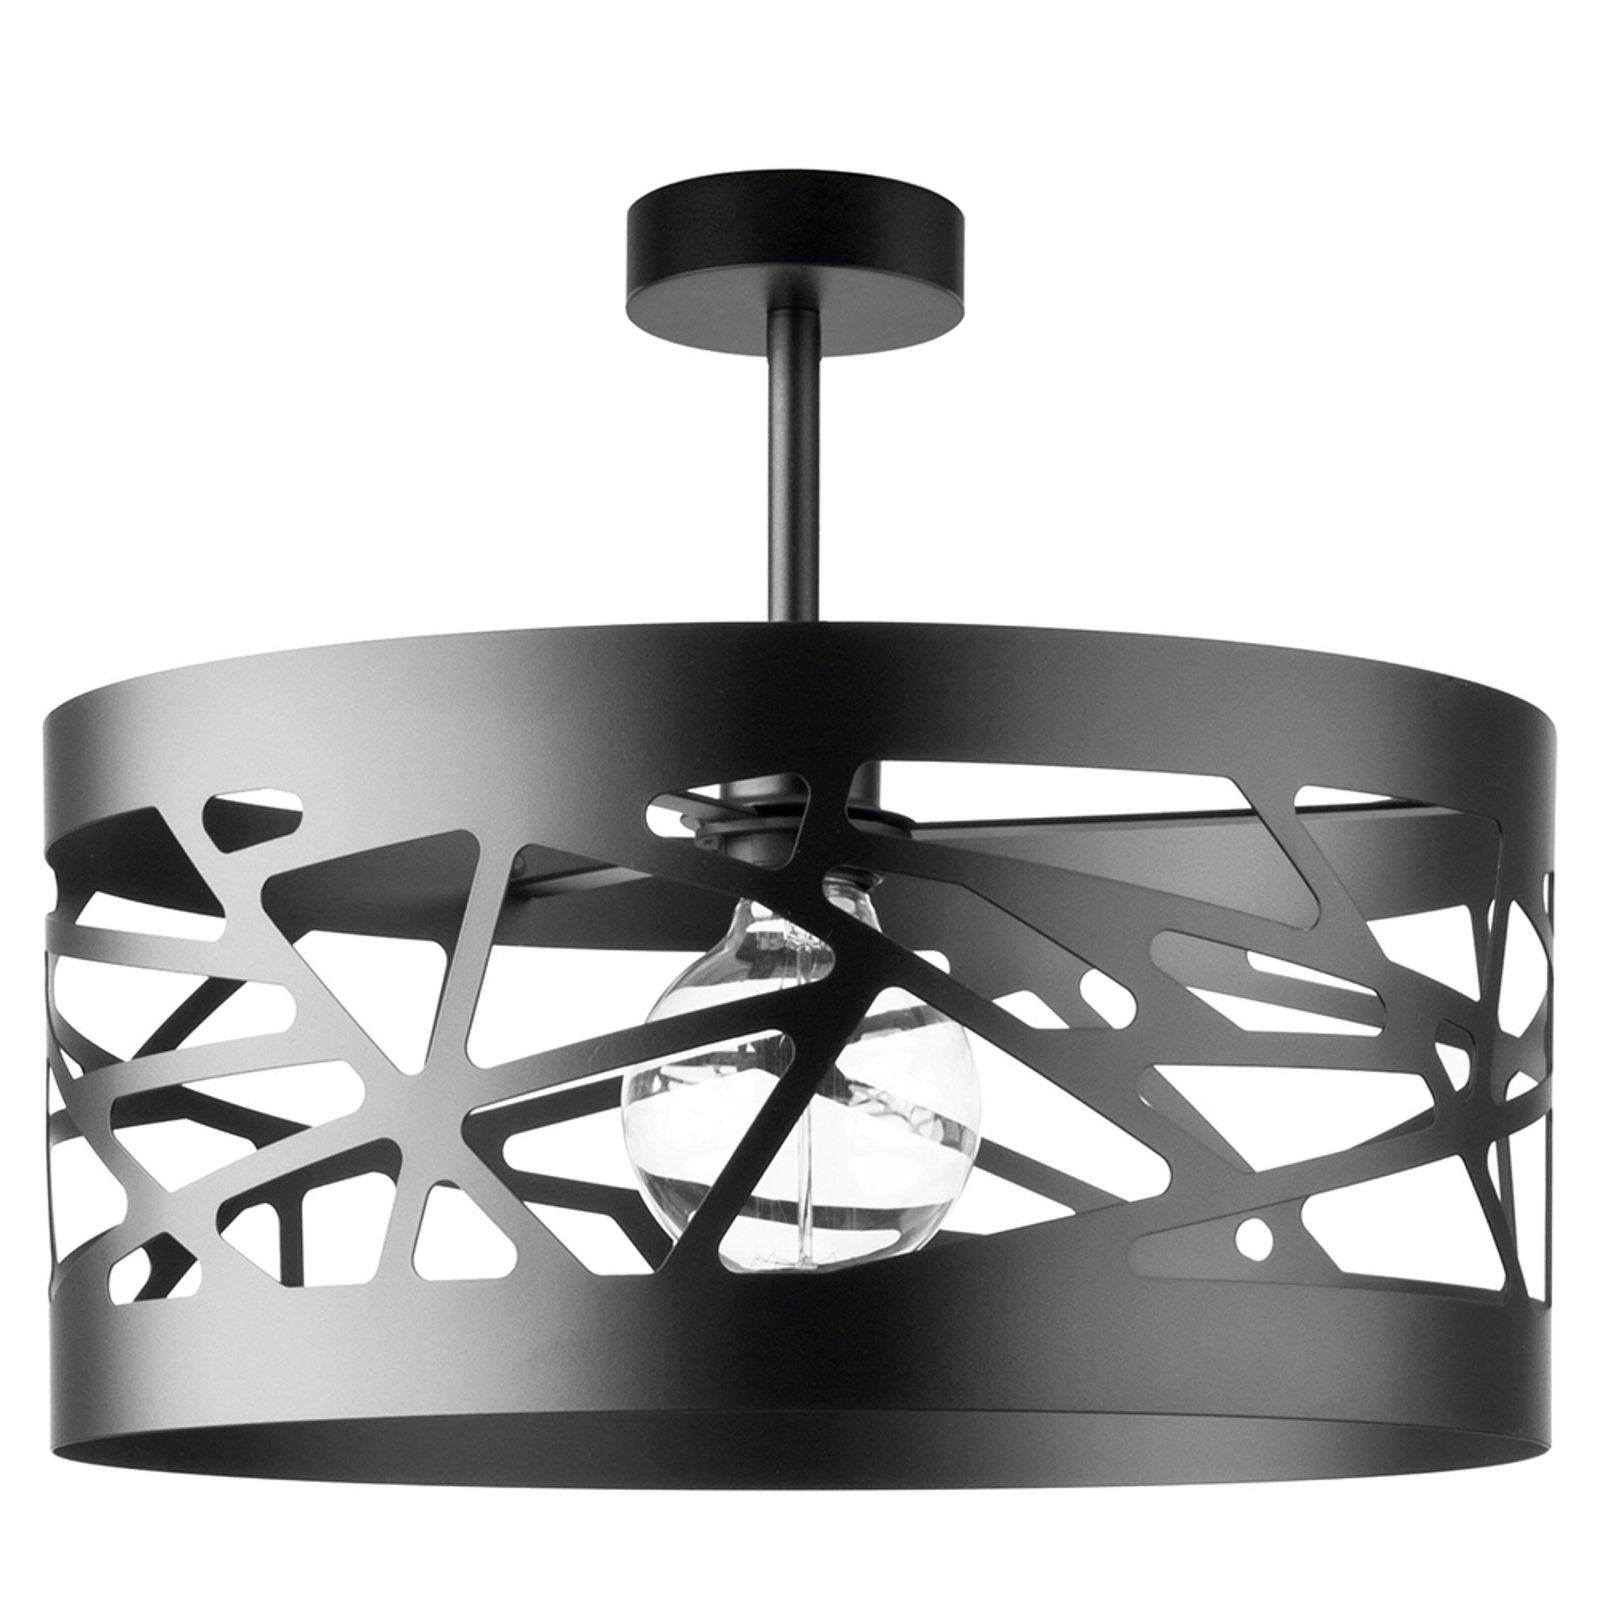 Taklampe Modul Frez mønsterskjerm Ø39cm svart